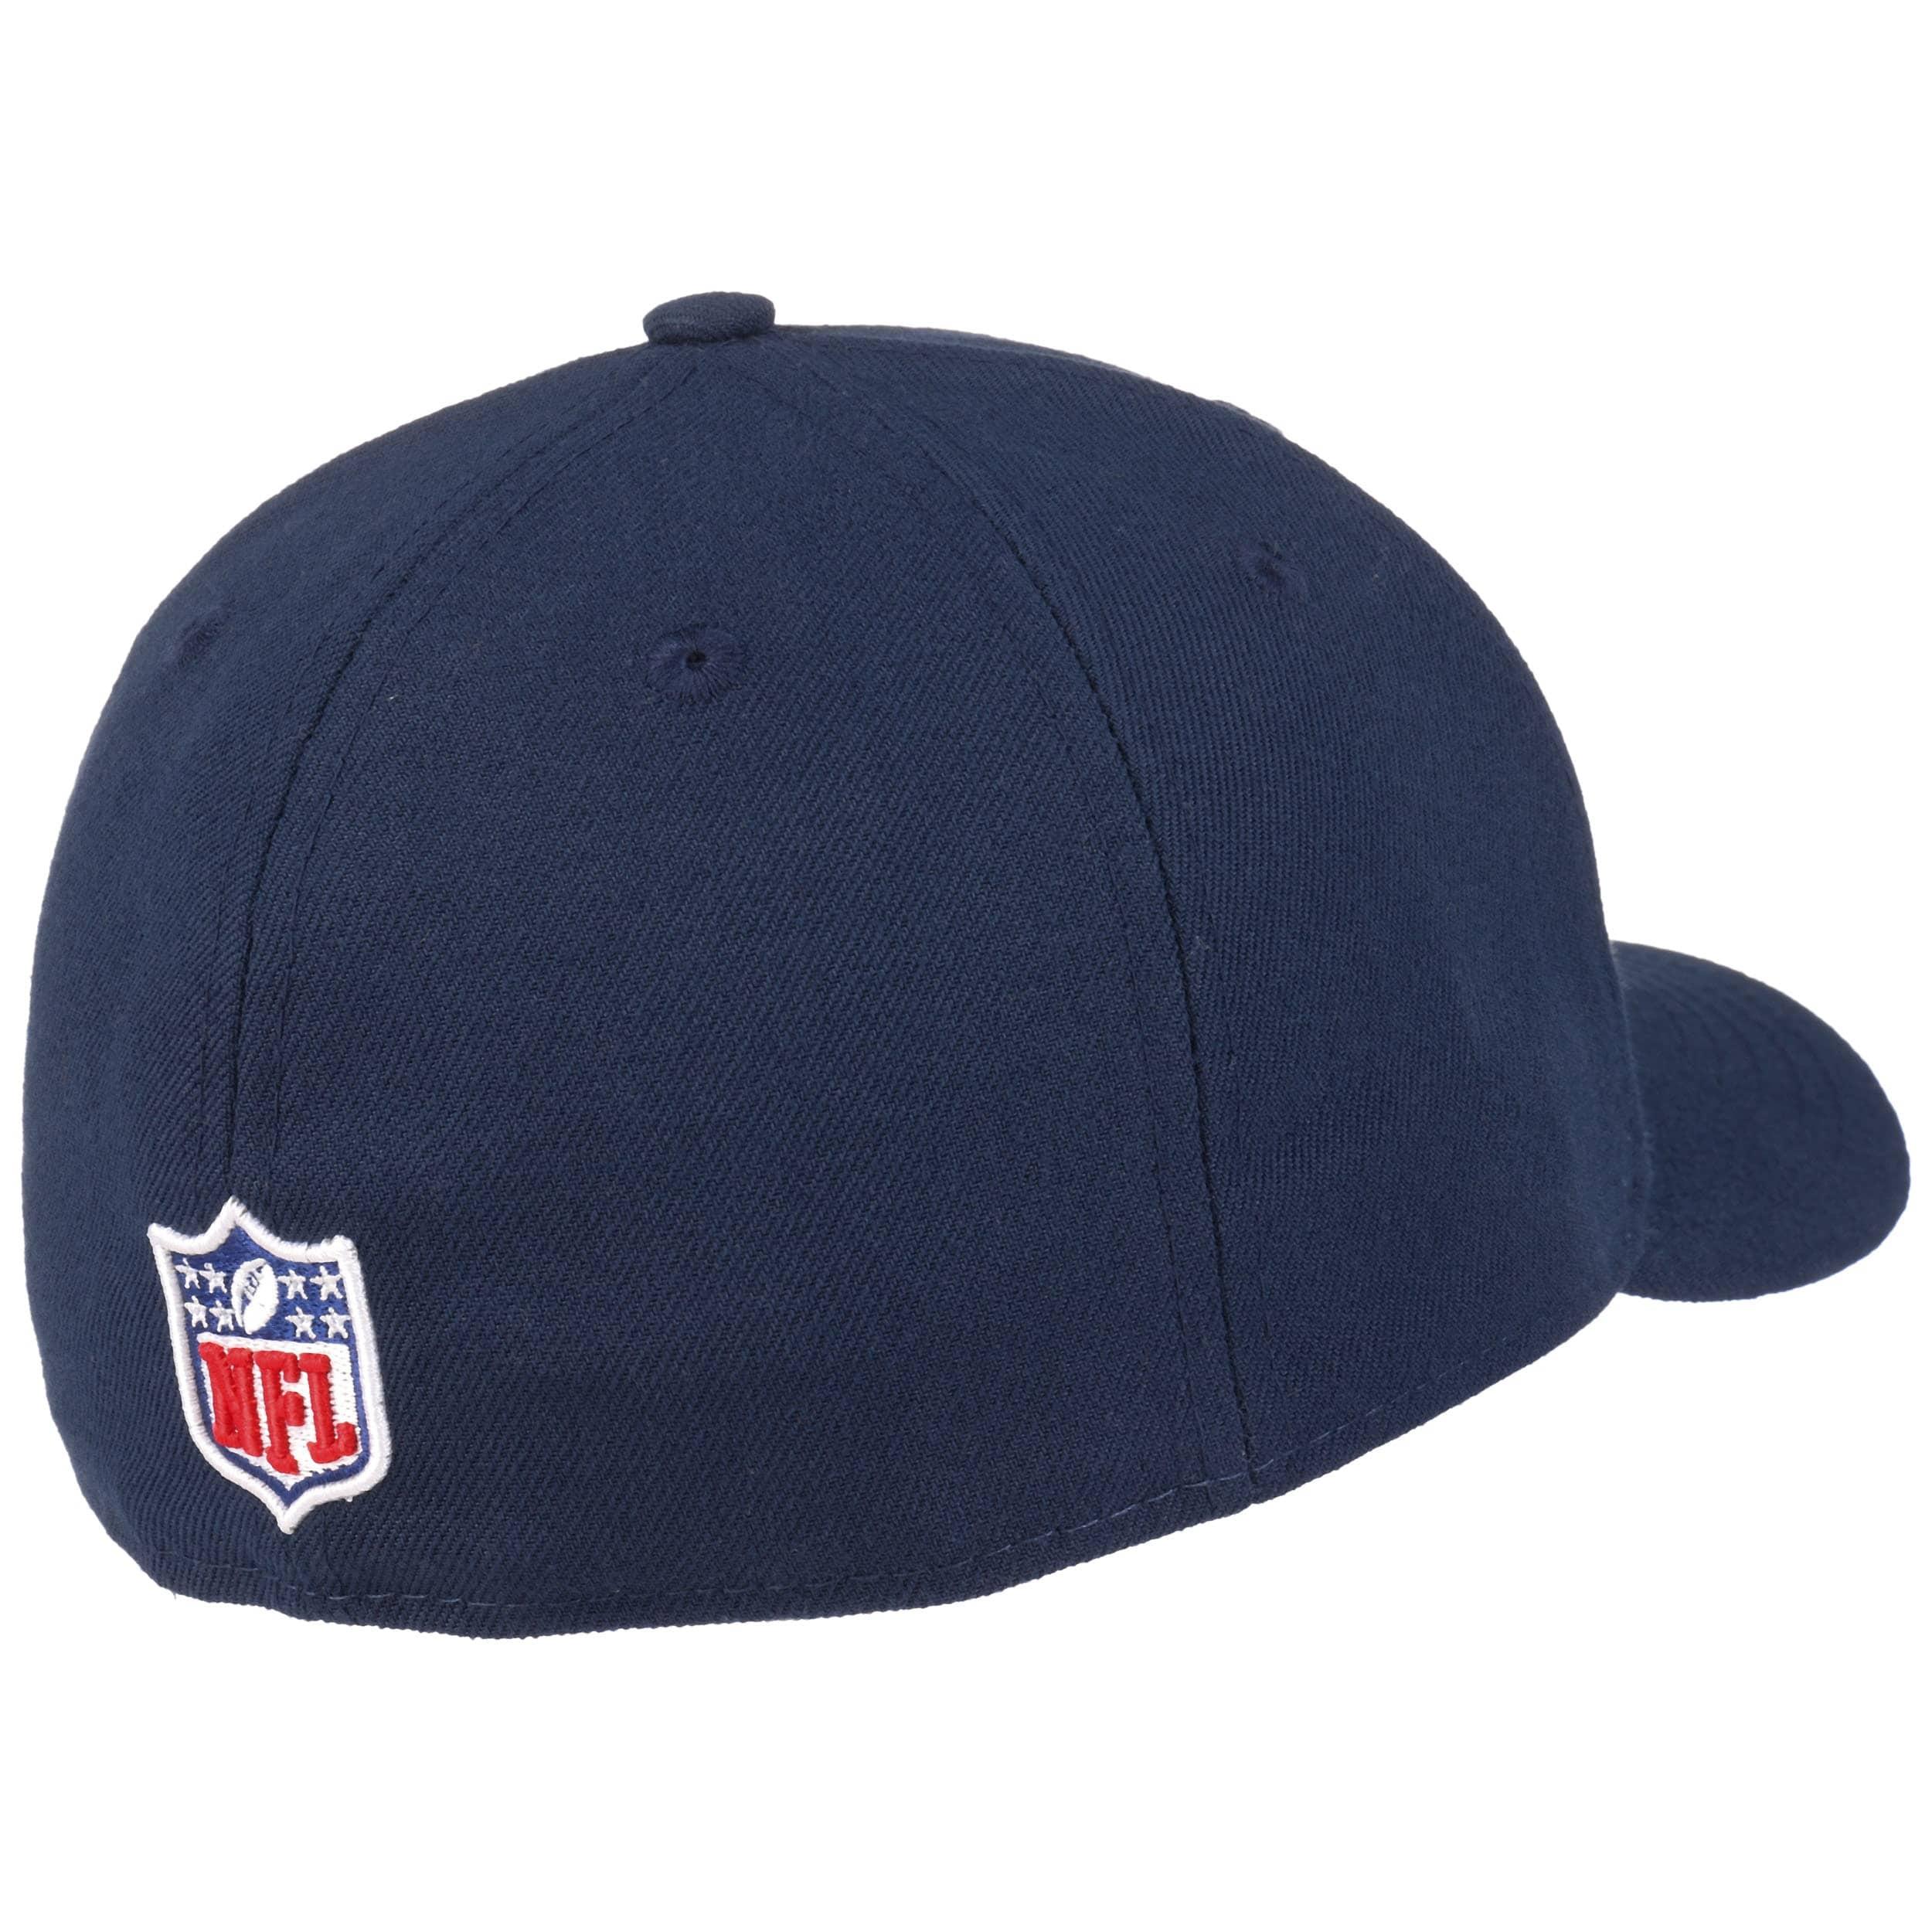 dabdfb8939c ... 59Fifty Low Profile Patriots Cap by New Era - navy 3 ...